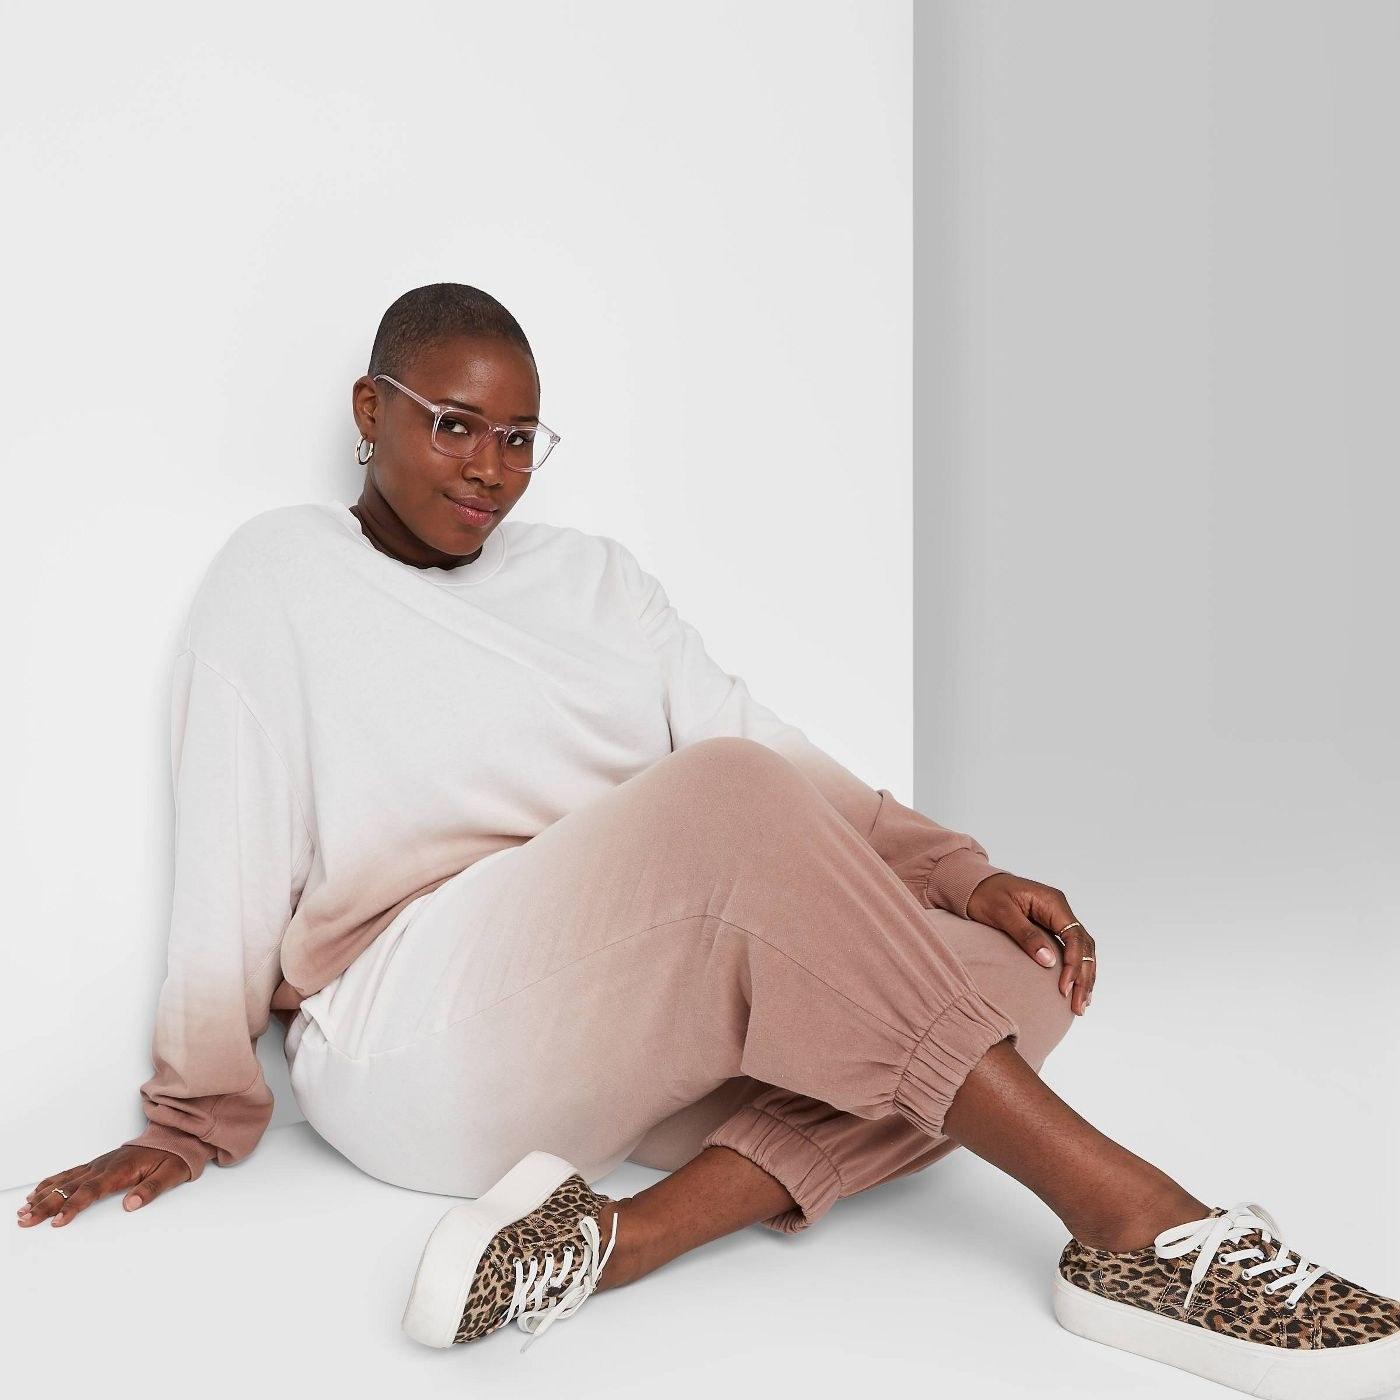 Model in high rise vintage sweatpants in tie dye